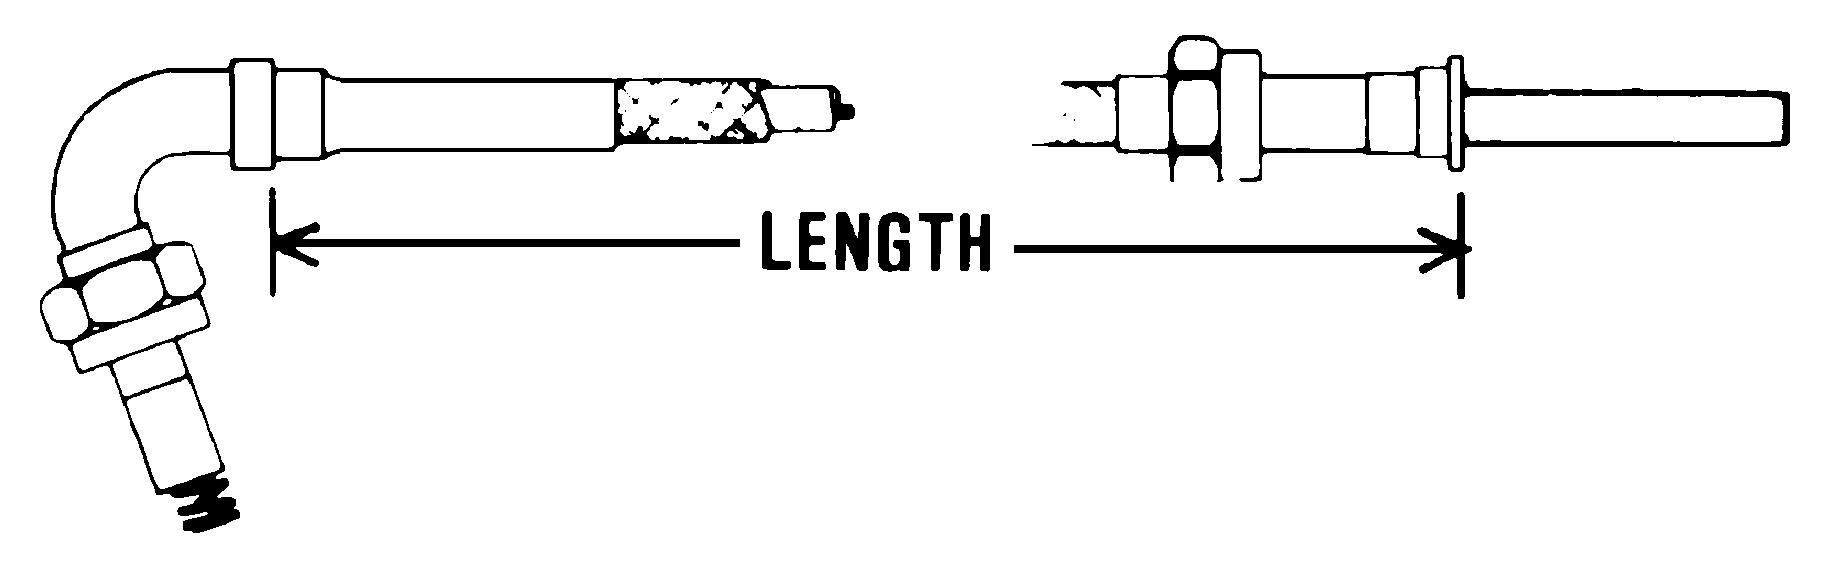 ignition-lead-model-102.jpg